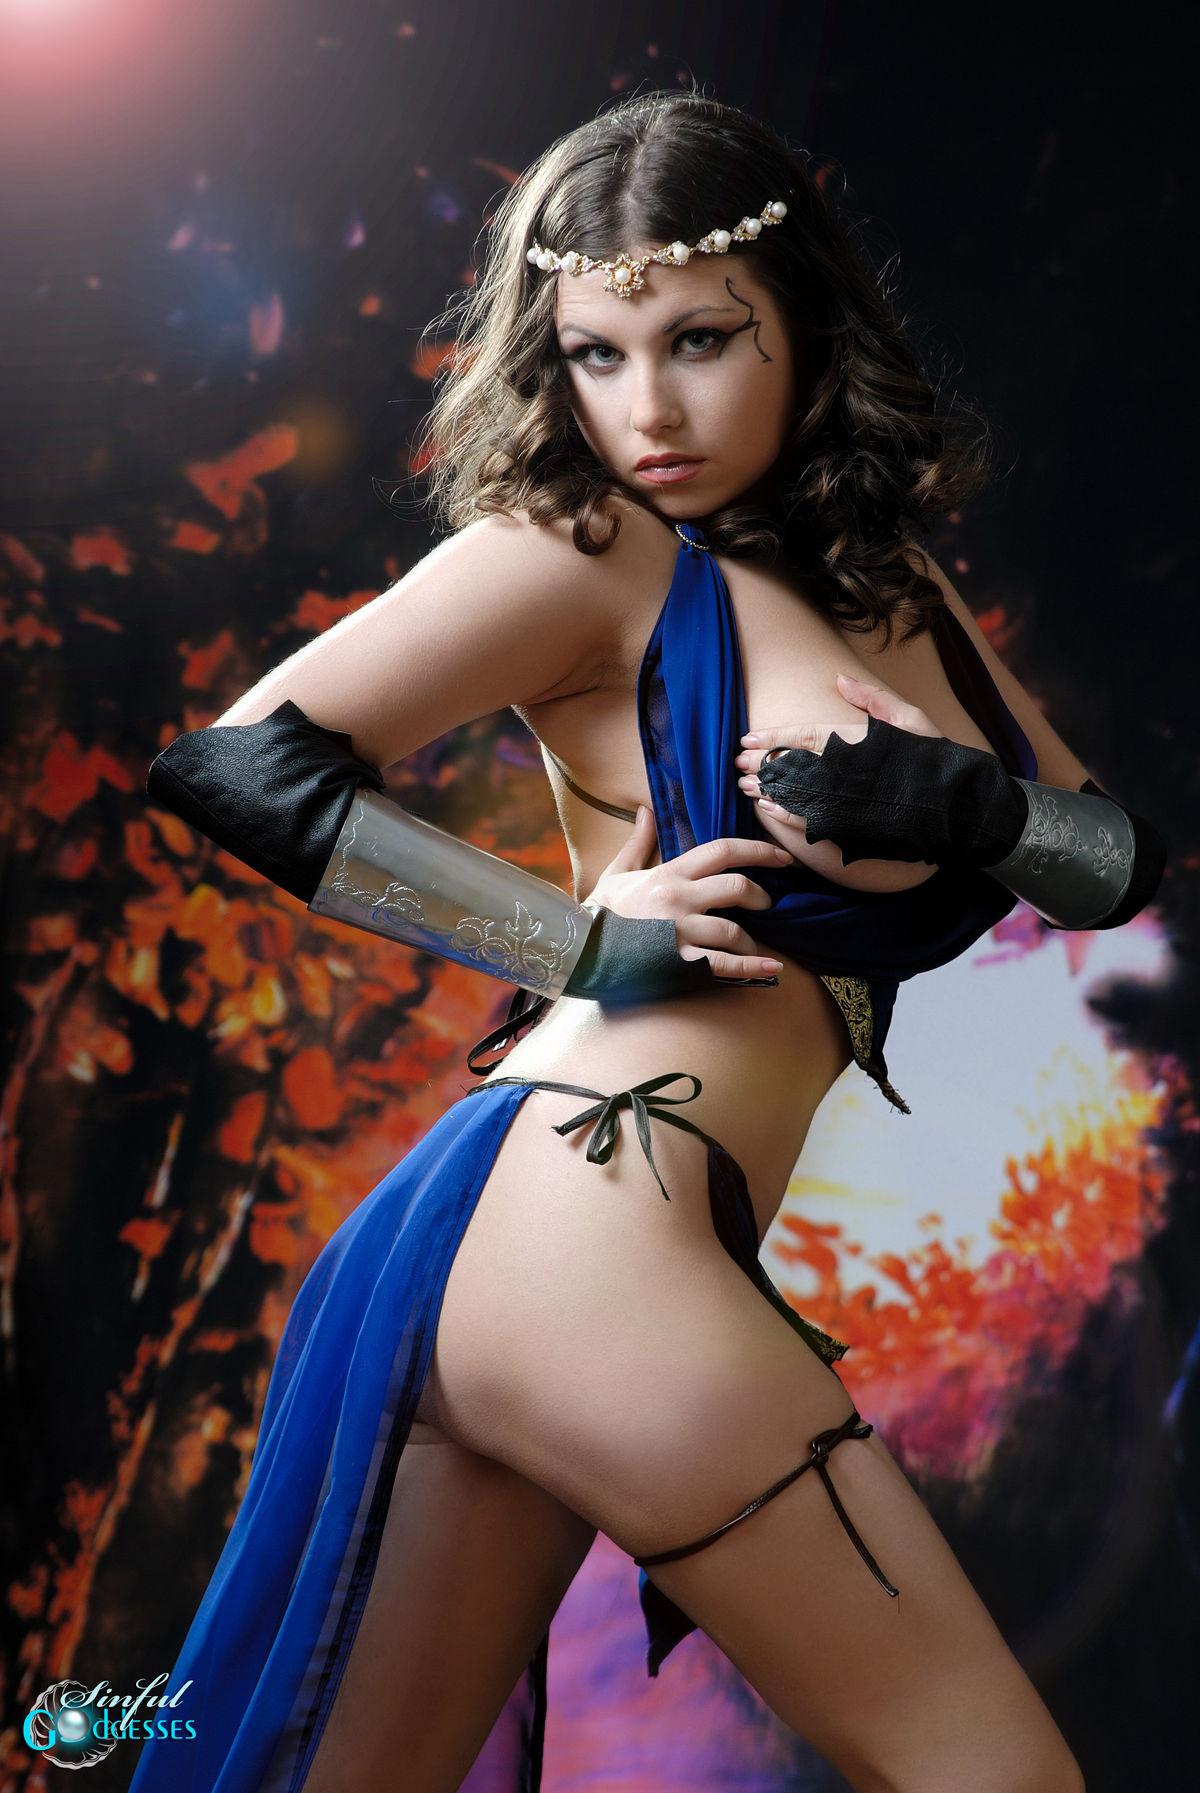 A muscle goddess bedroom fantasy full version